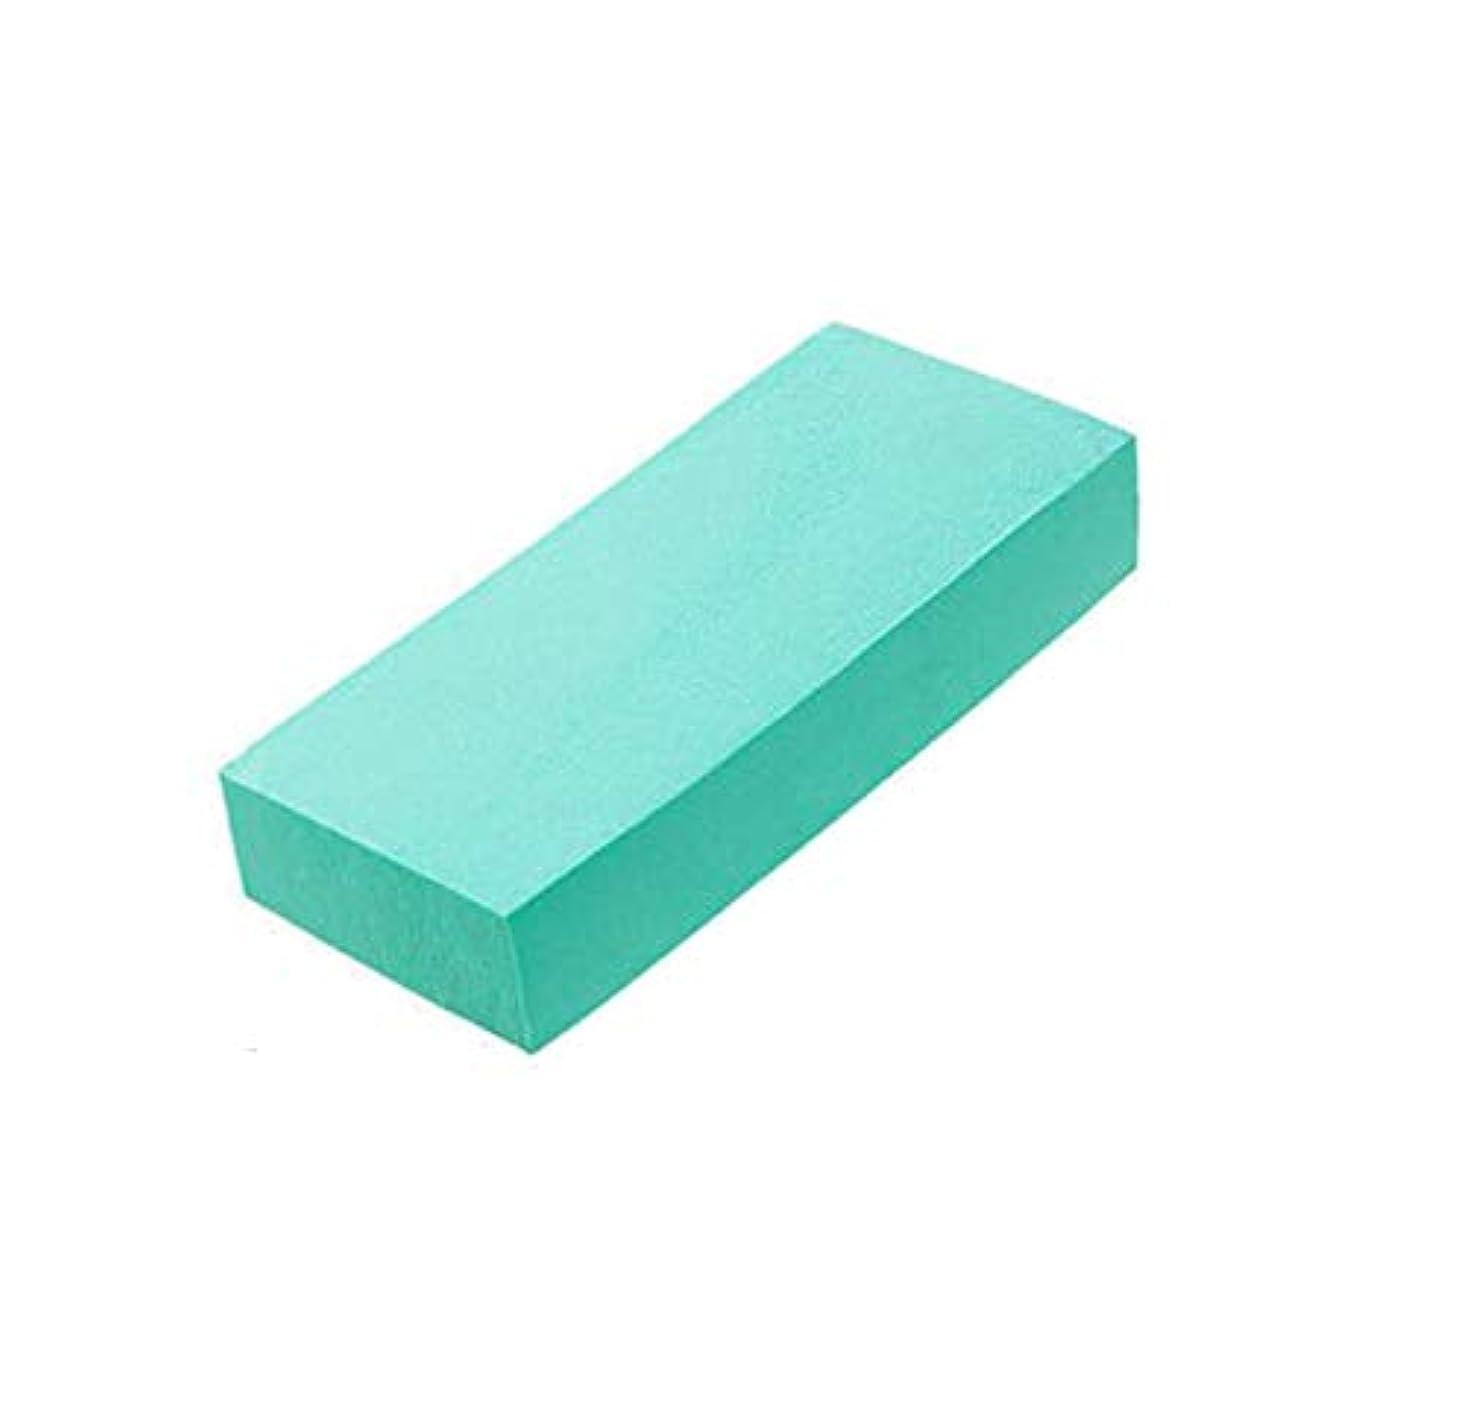 HJ ボディスポンジ やわらか 泡立ち ソフト シャワースポンジ お風呂 背中 業務用 家庭用 綿 バスグッズ (8個セット 色ランダム)